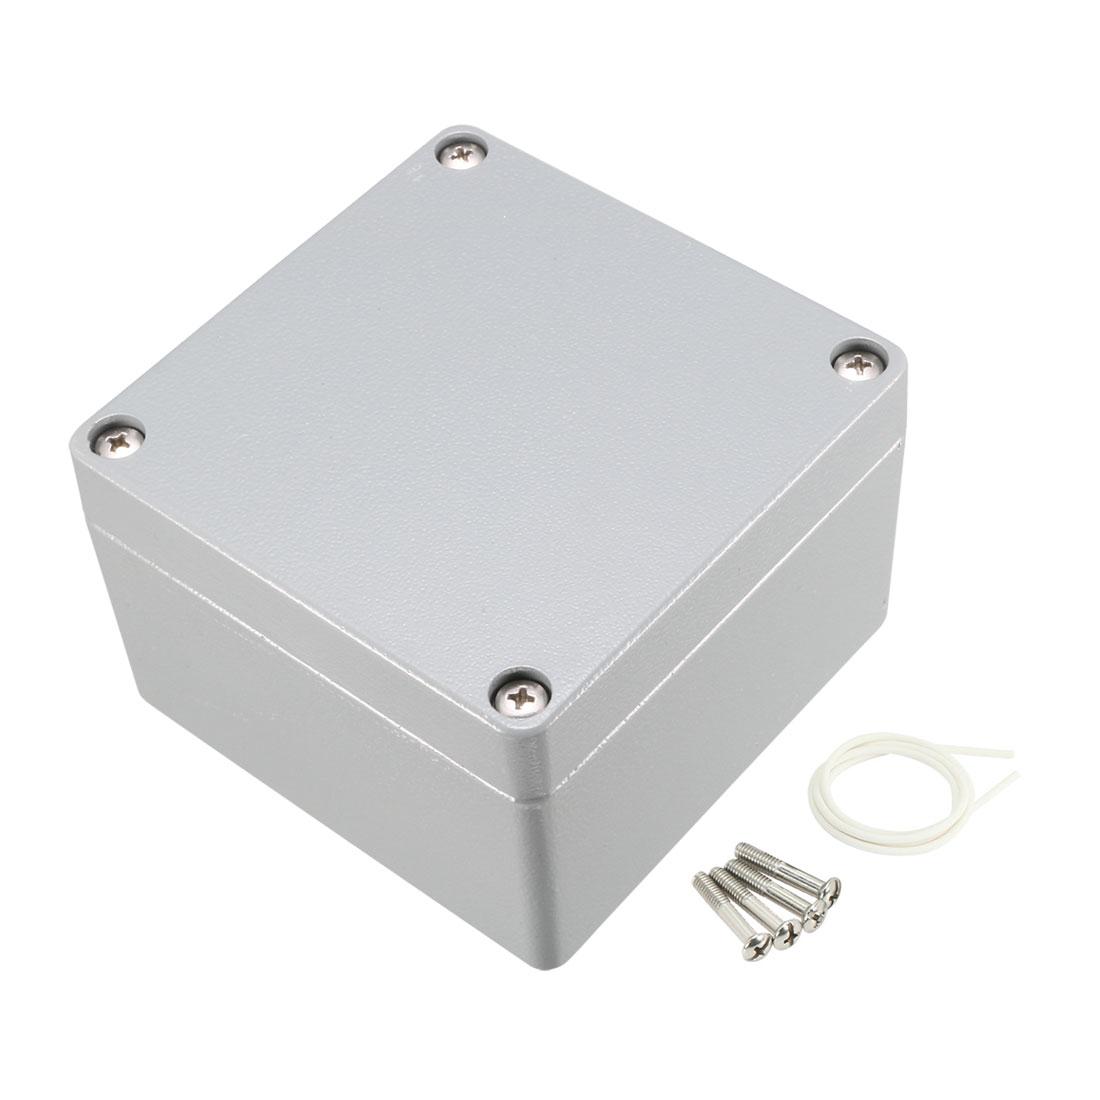 "4.7""x4.7""x3.2"" Aluminum Junction Box Universal Electric Enclosure"